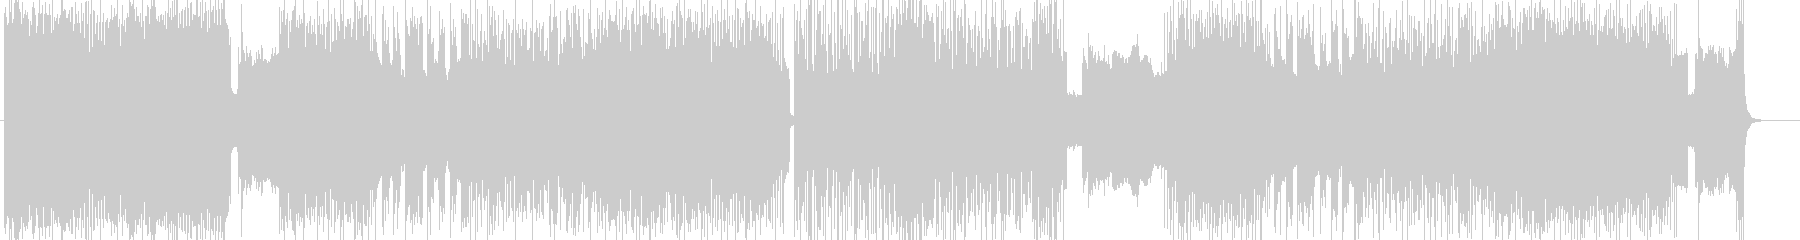 「HR/HM」「DEATH」BGM173の未再生の波形